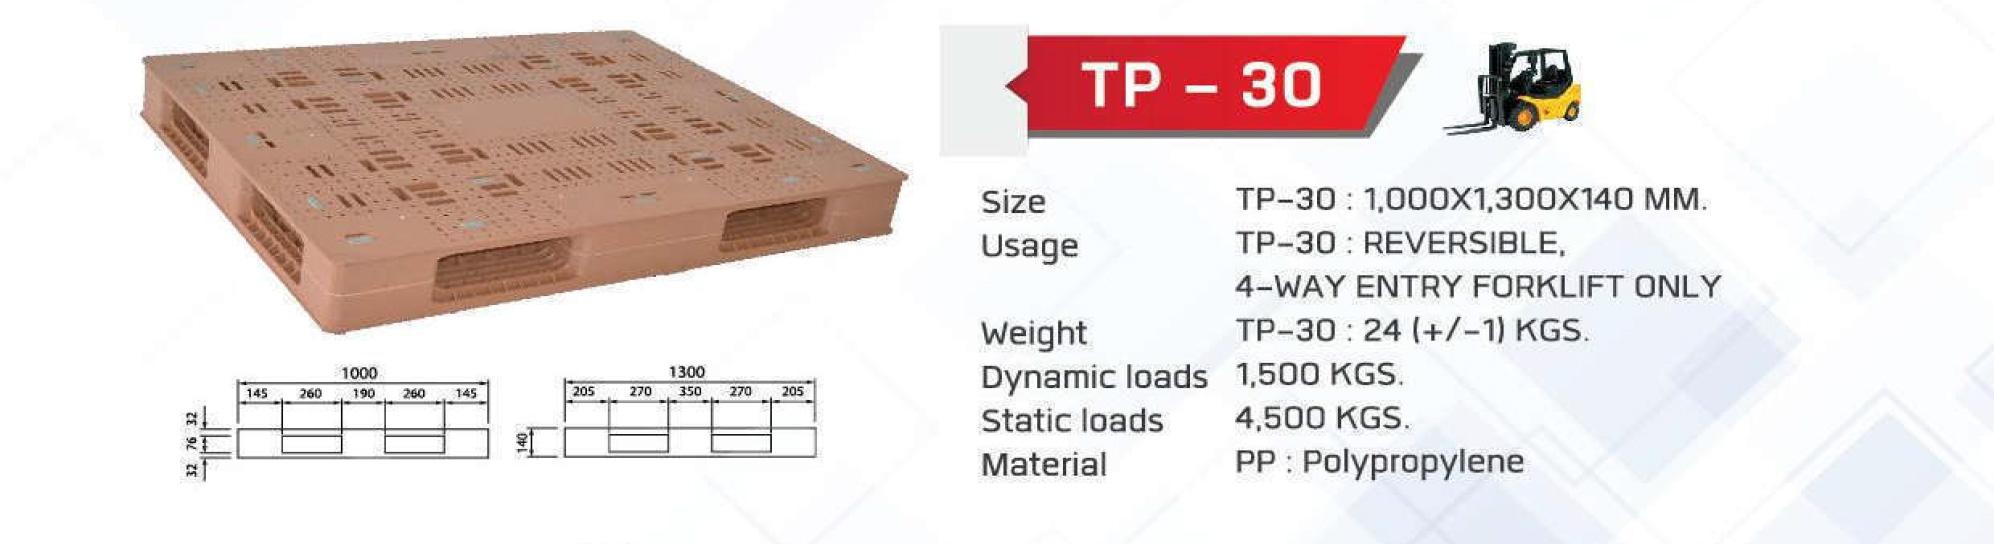 Reversible-MediumDuty-TP-30